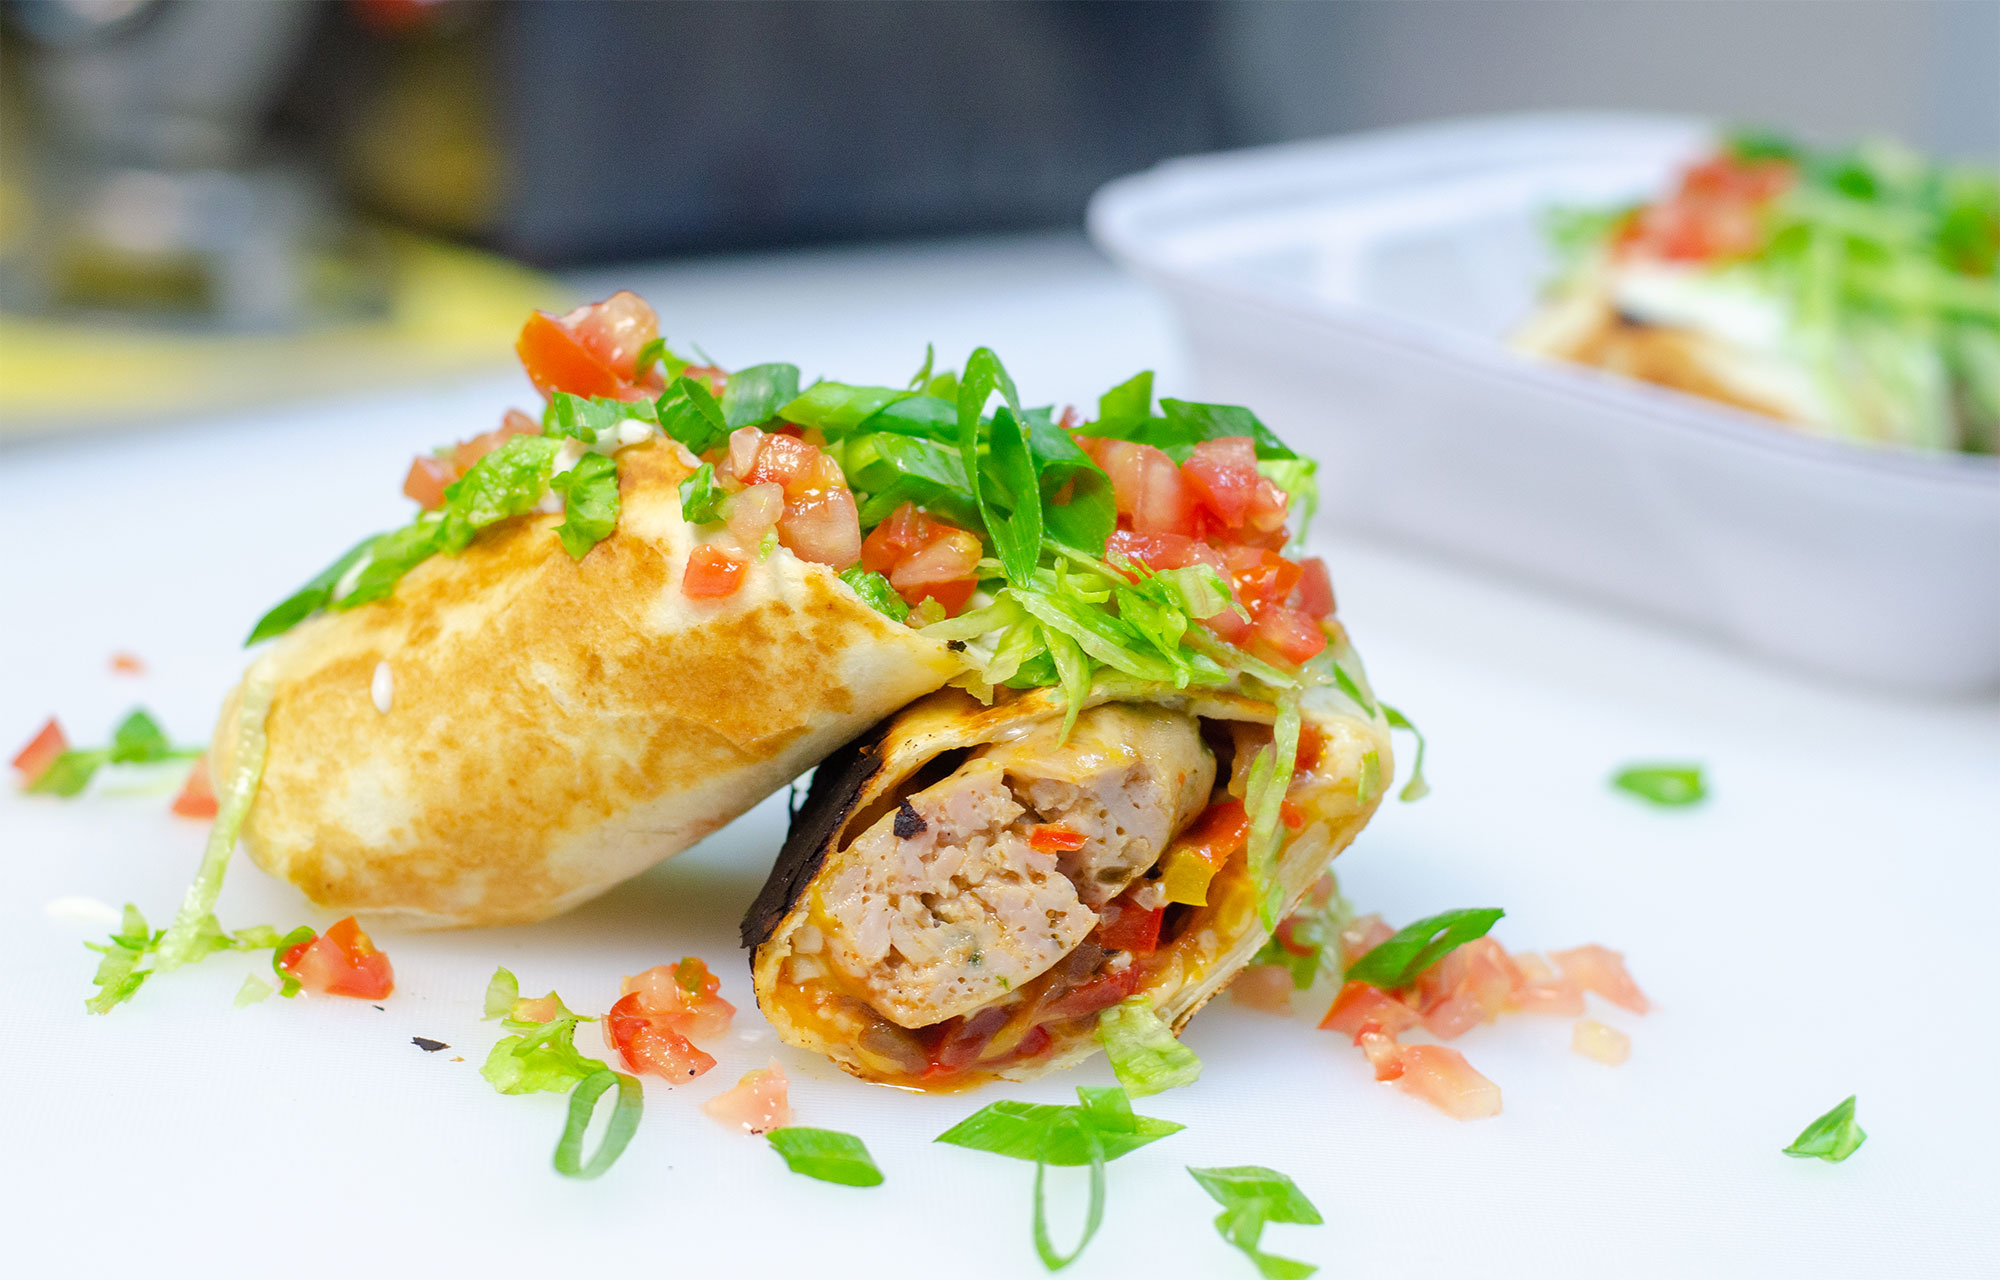 The Fajita Sausage from Robbie's Gourmet Sausage Co. in Windsor, Ontario.